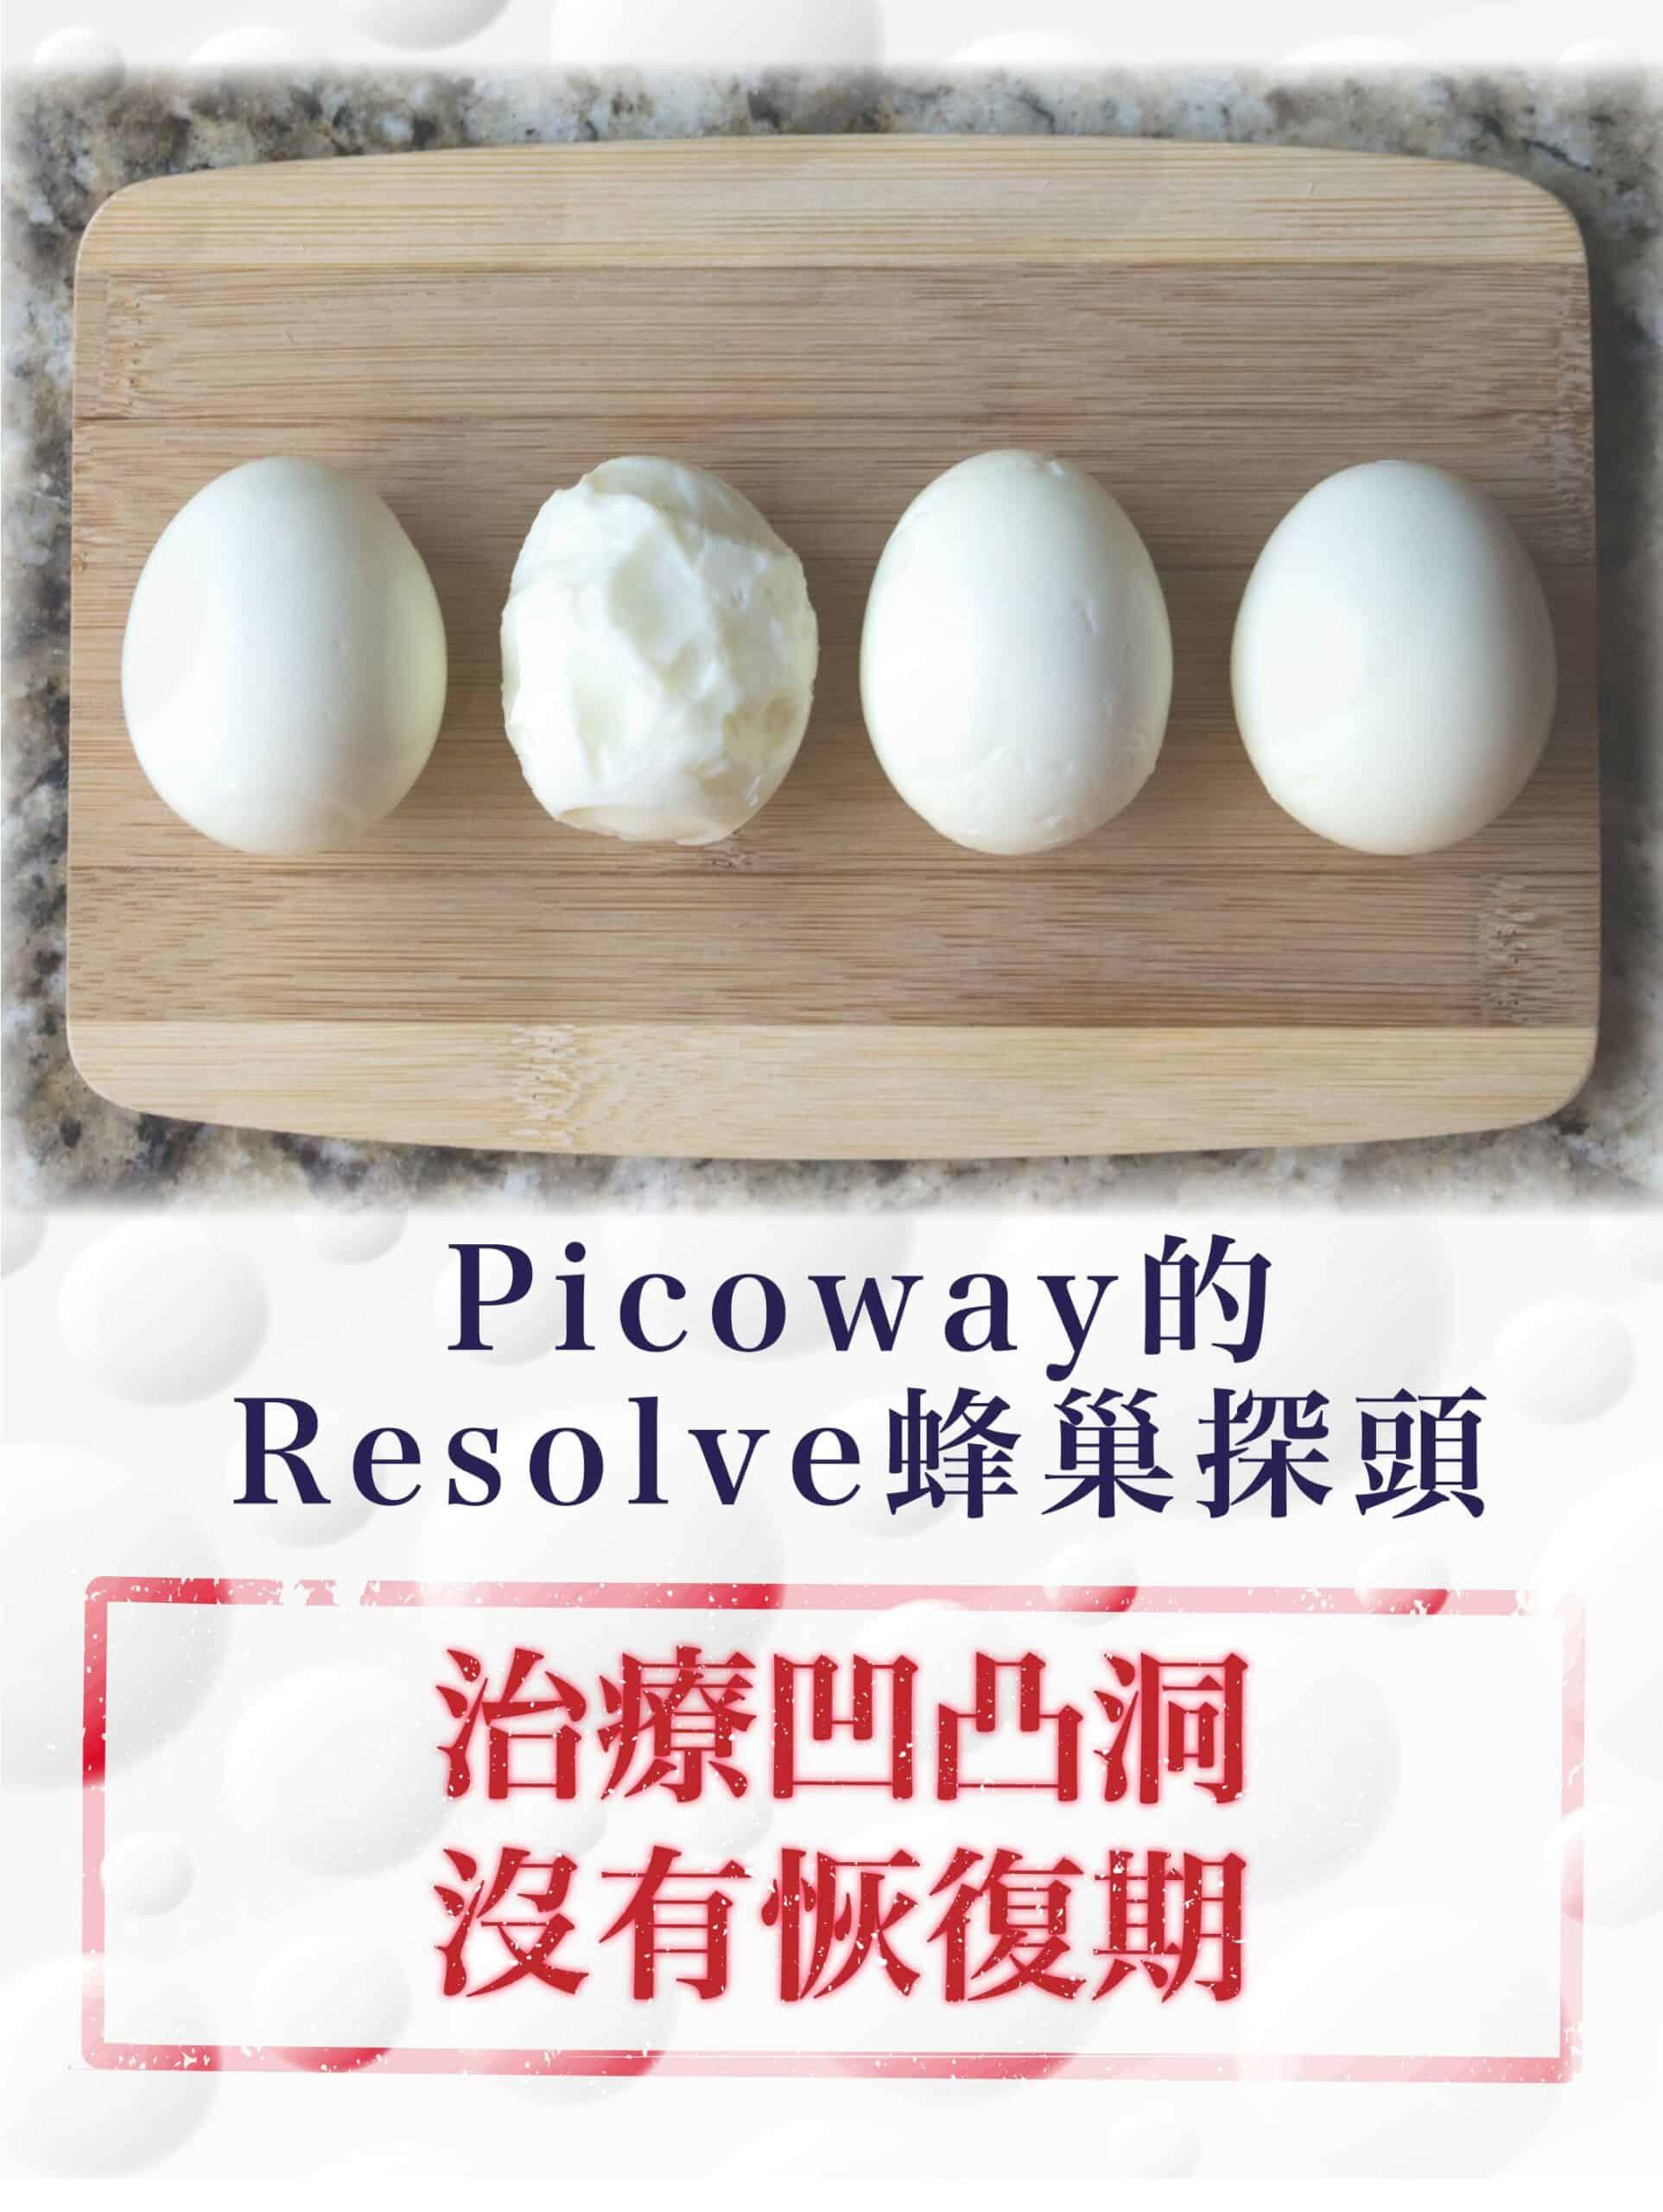 picoway_n03 pico bump hole 17 scaled